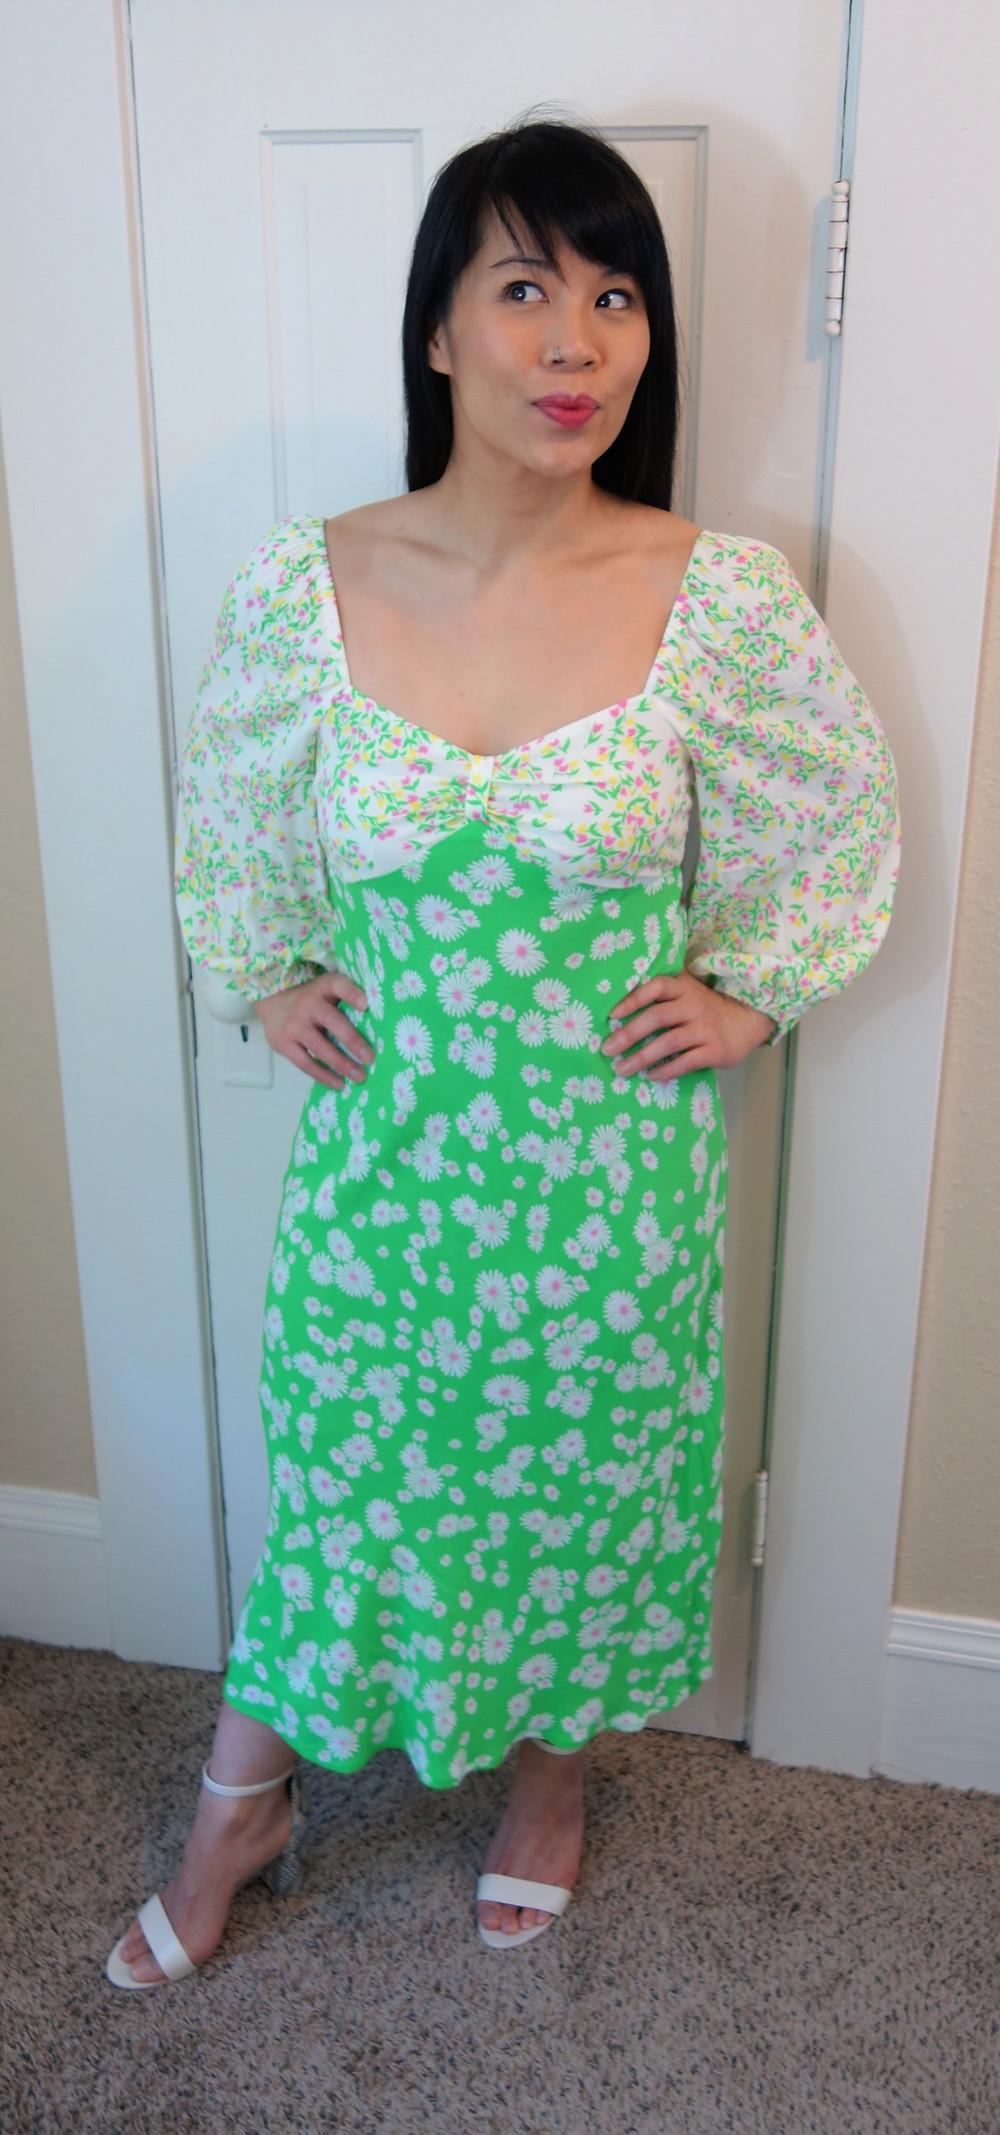 Floral Midi Dress - Kat Depner